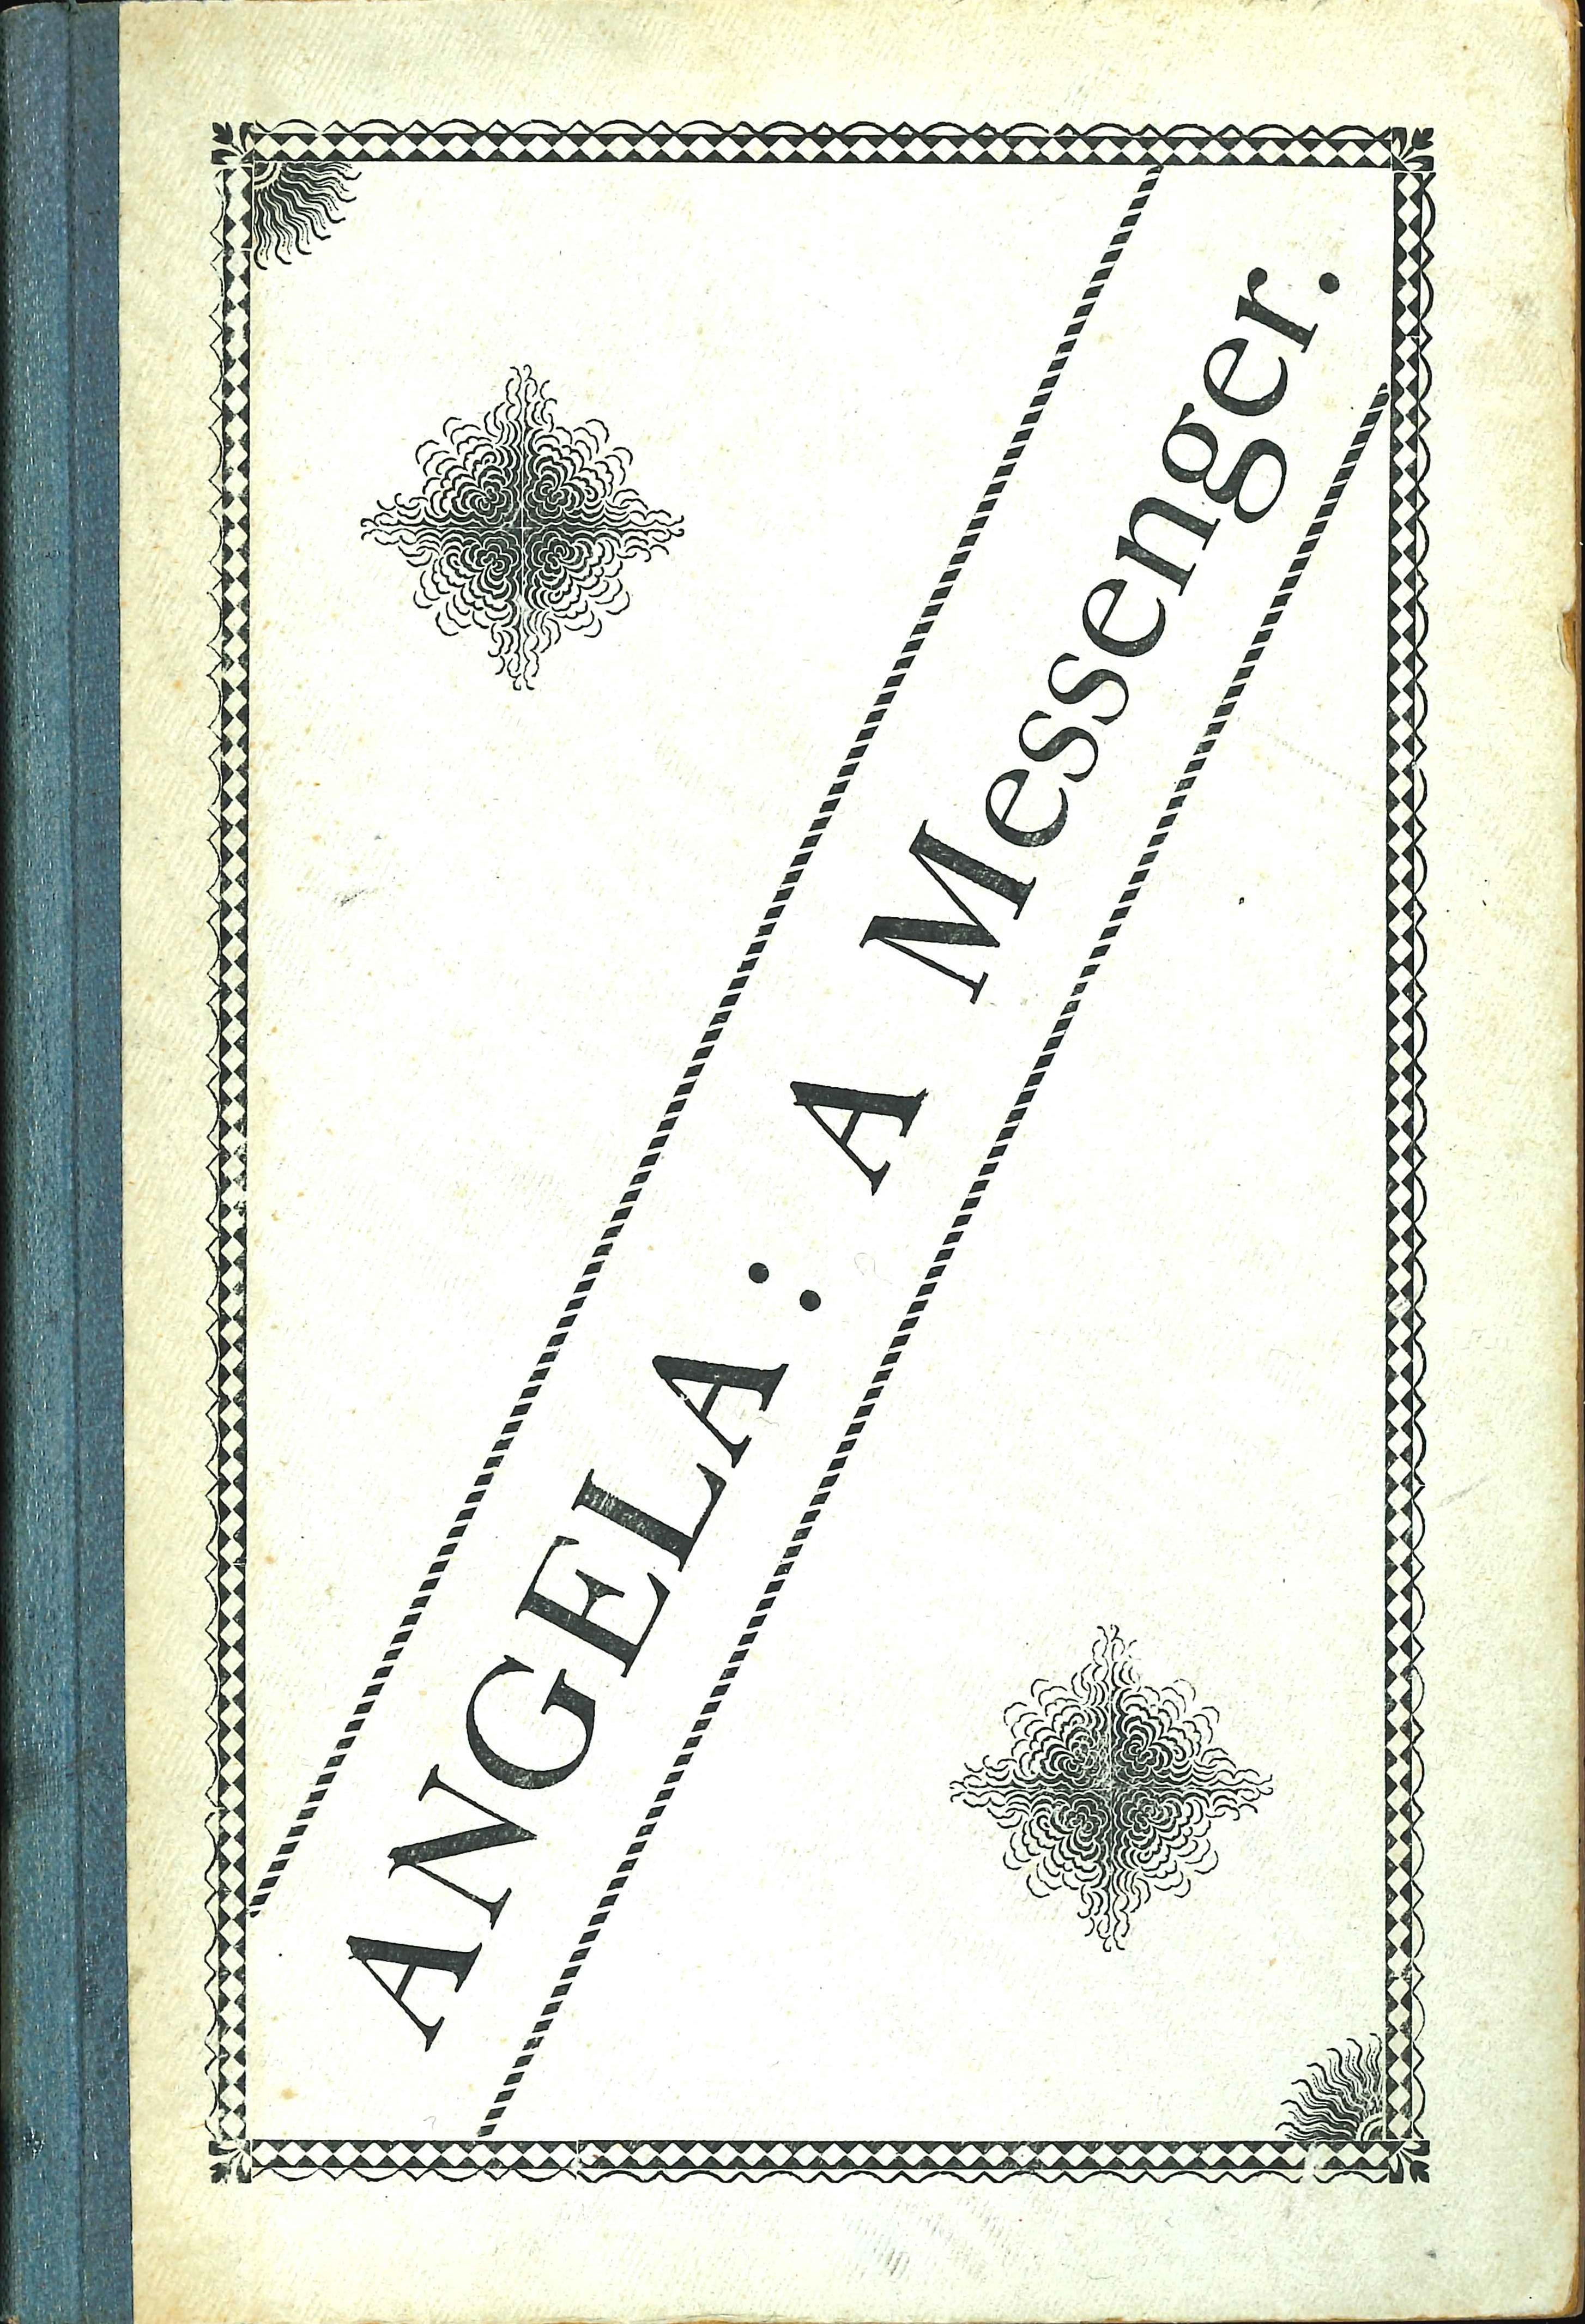 Edith Searle Grossmann. Angela: a messenger. Christchurch: Simpson & Williams, 1890.